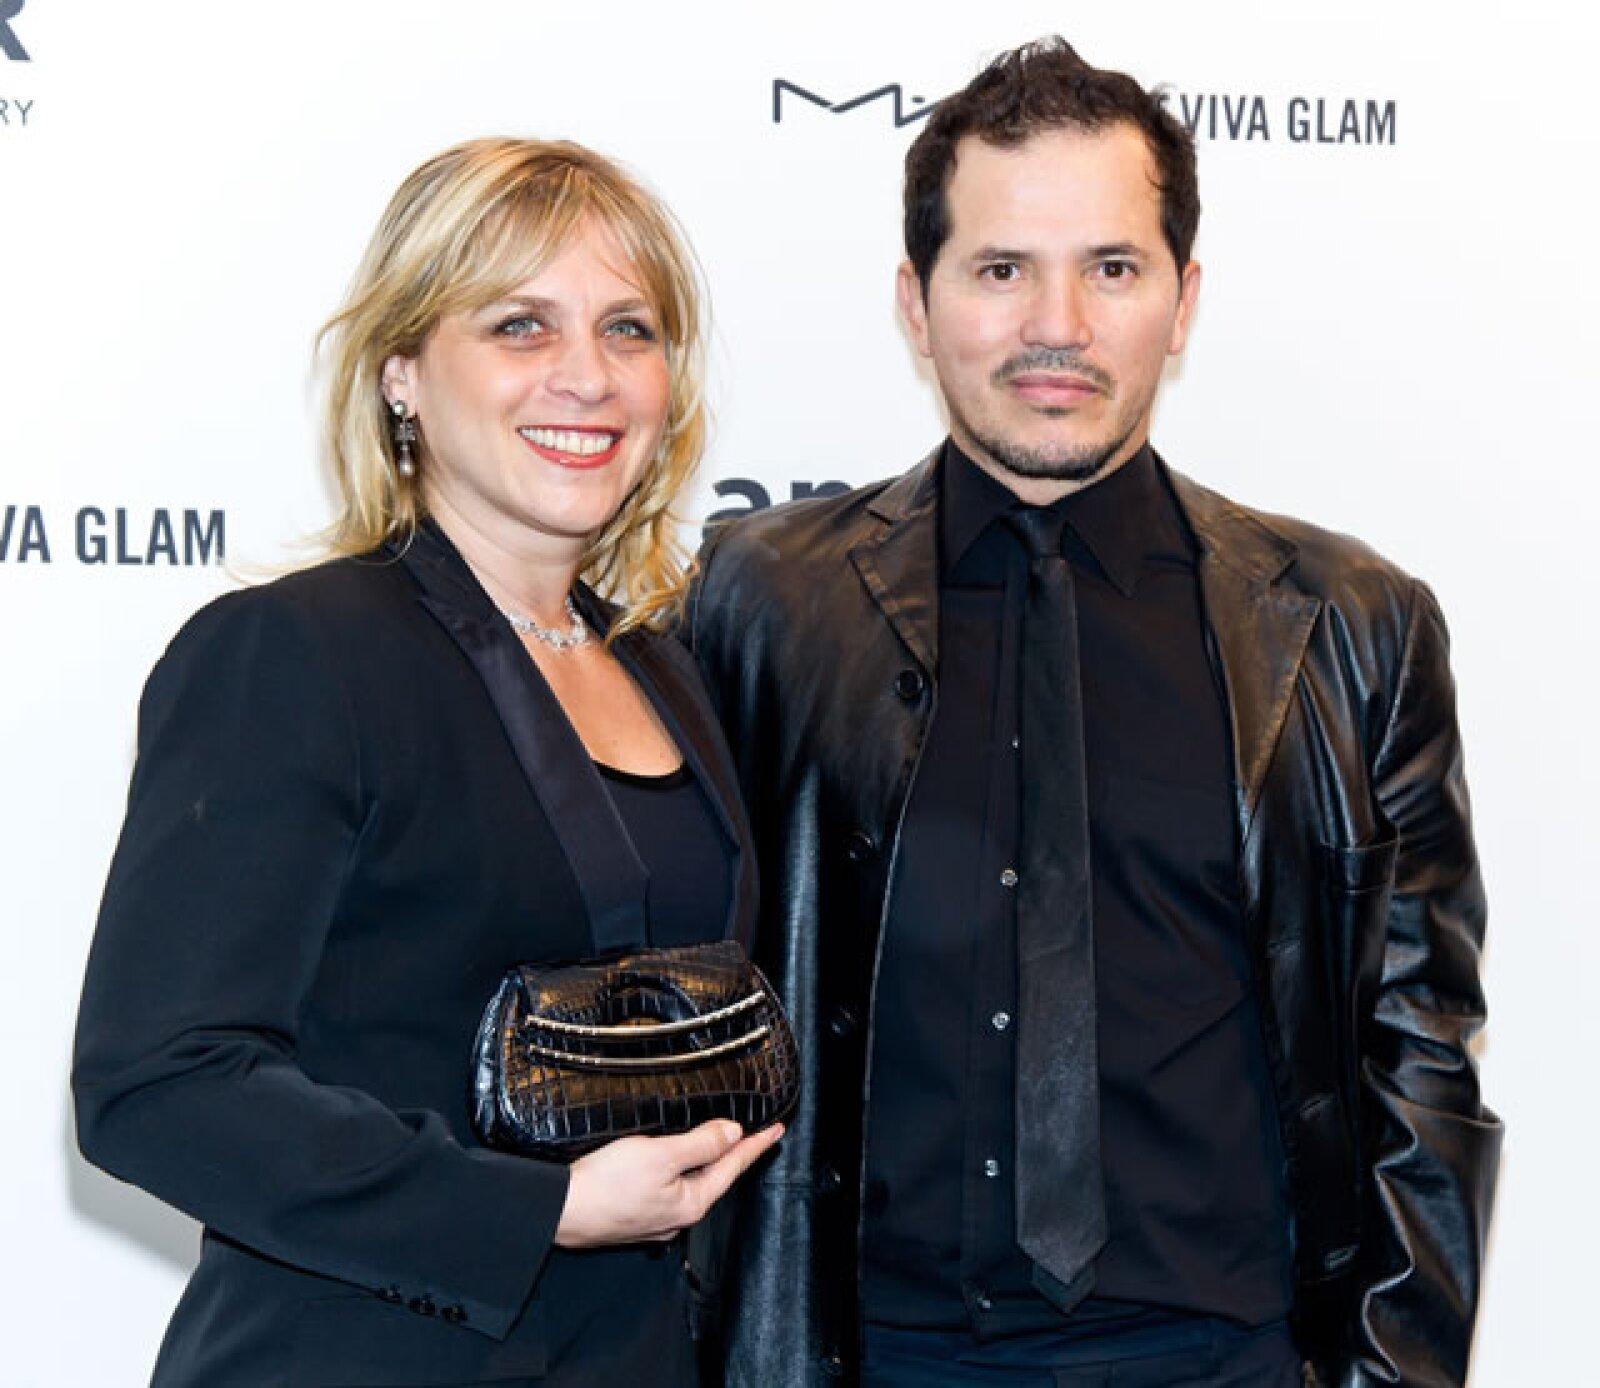 Justine Maurer y John Leguizamo